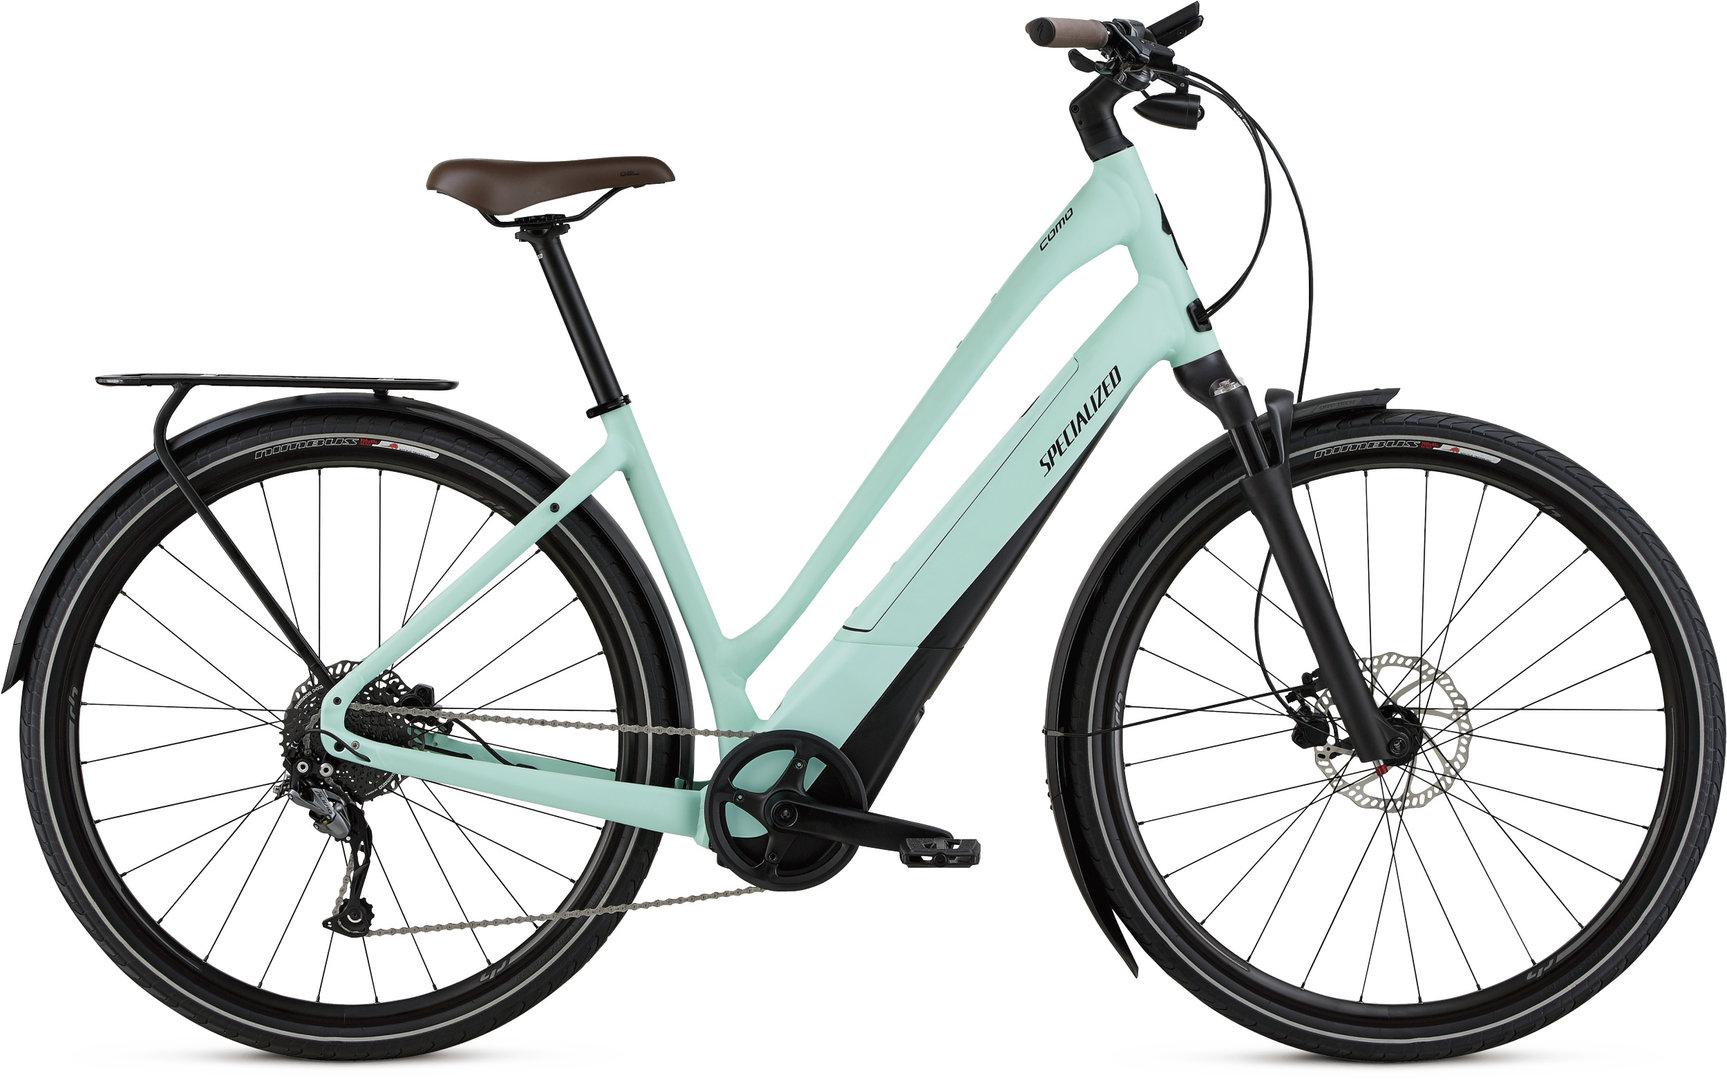 specialized turbo como 4 0 low entry elektro fahrrad ebike. Black Bedroom Furniture Sets. Home Design Ideas